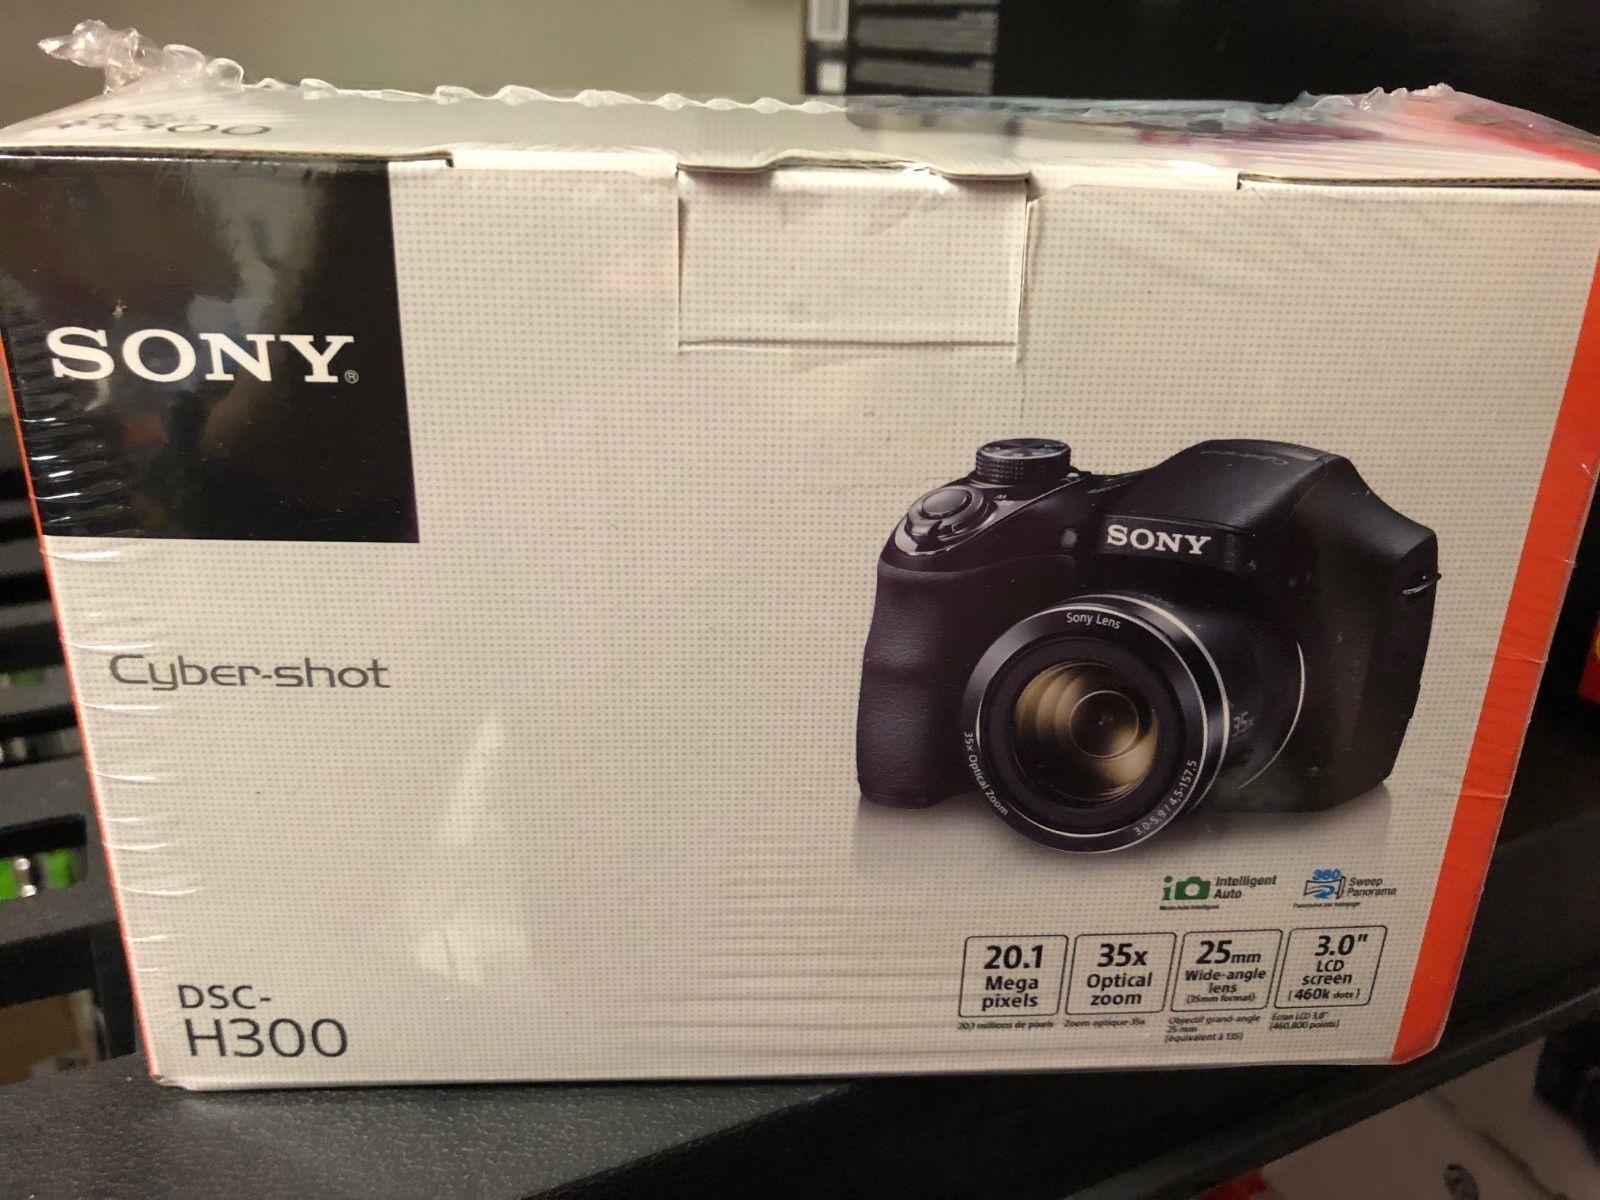 OB Sony Cyber-shot DSC-H300 20.1MP Digital Camera - Black